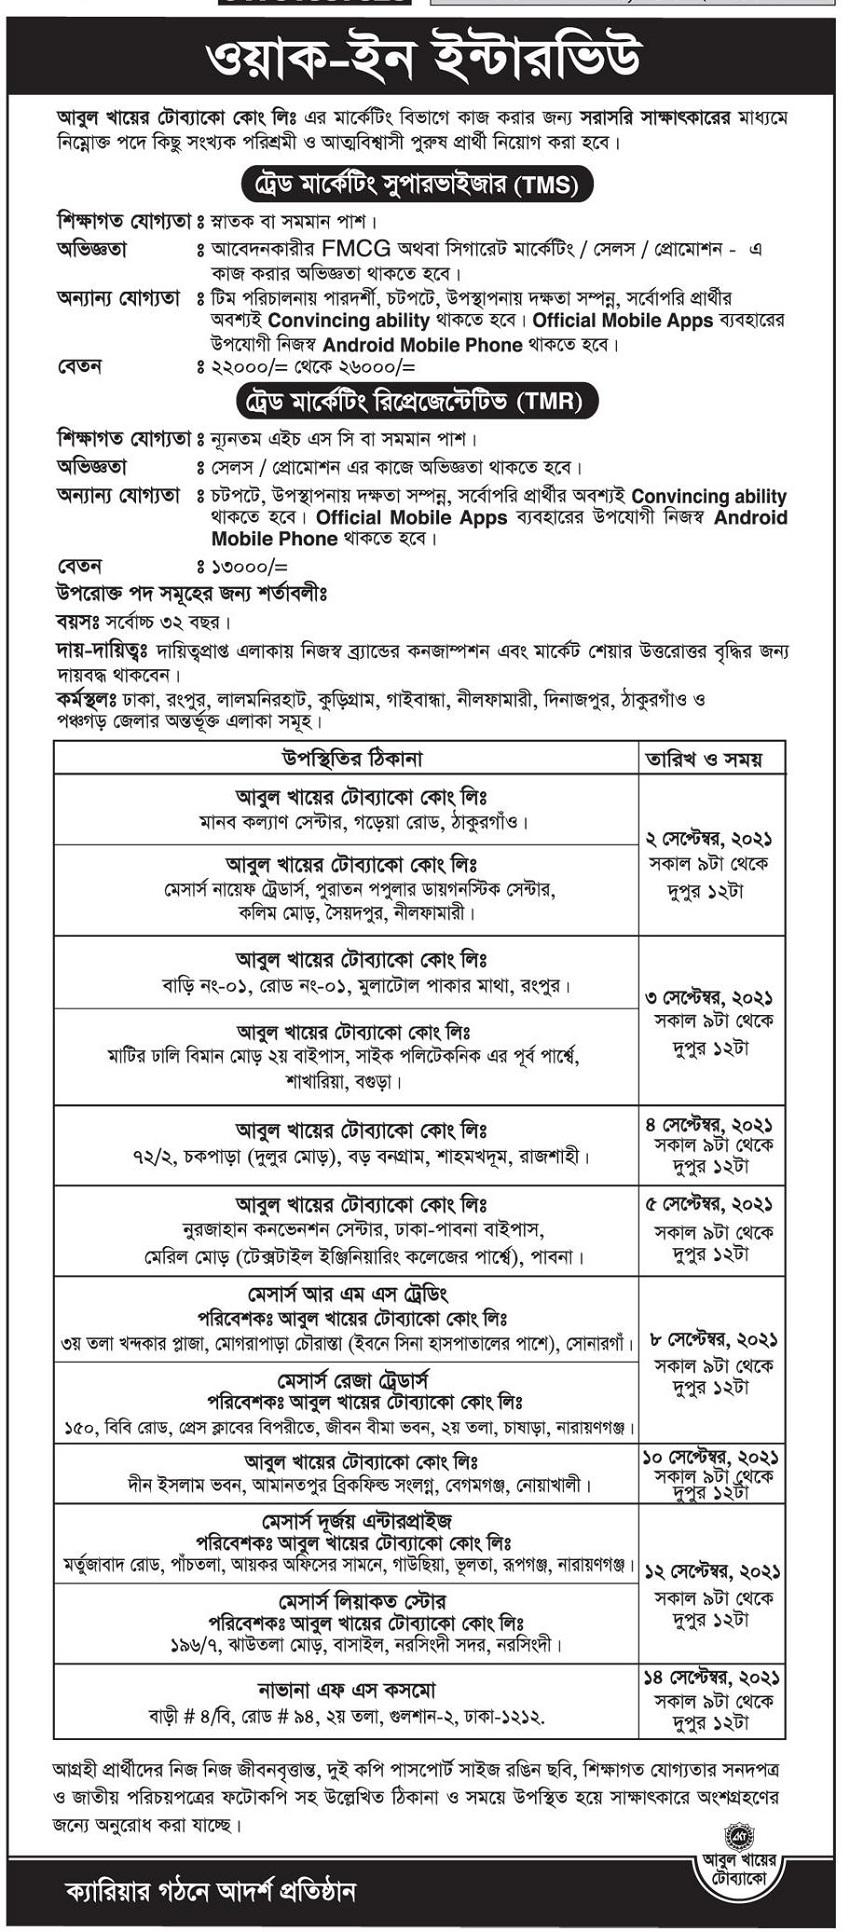 Abul Khair Tobacco Company Job Circular August 2021